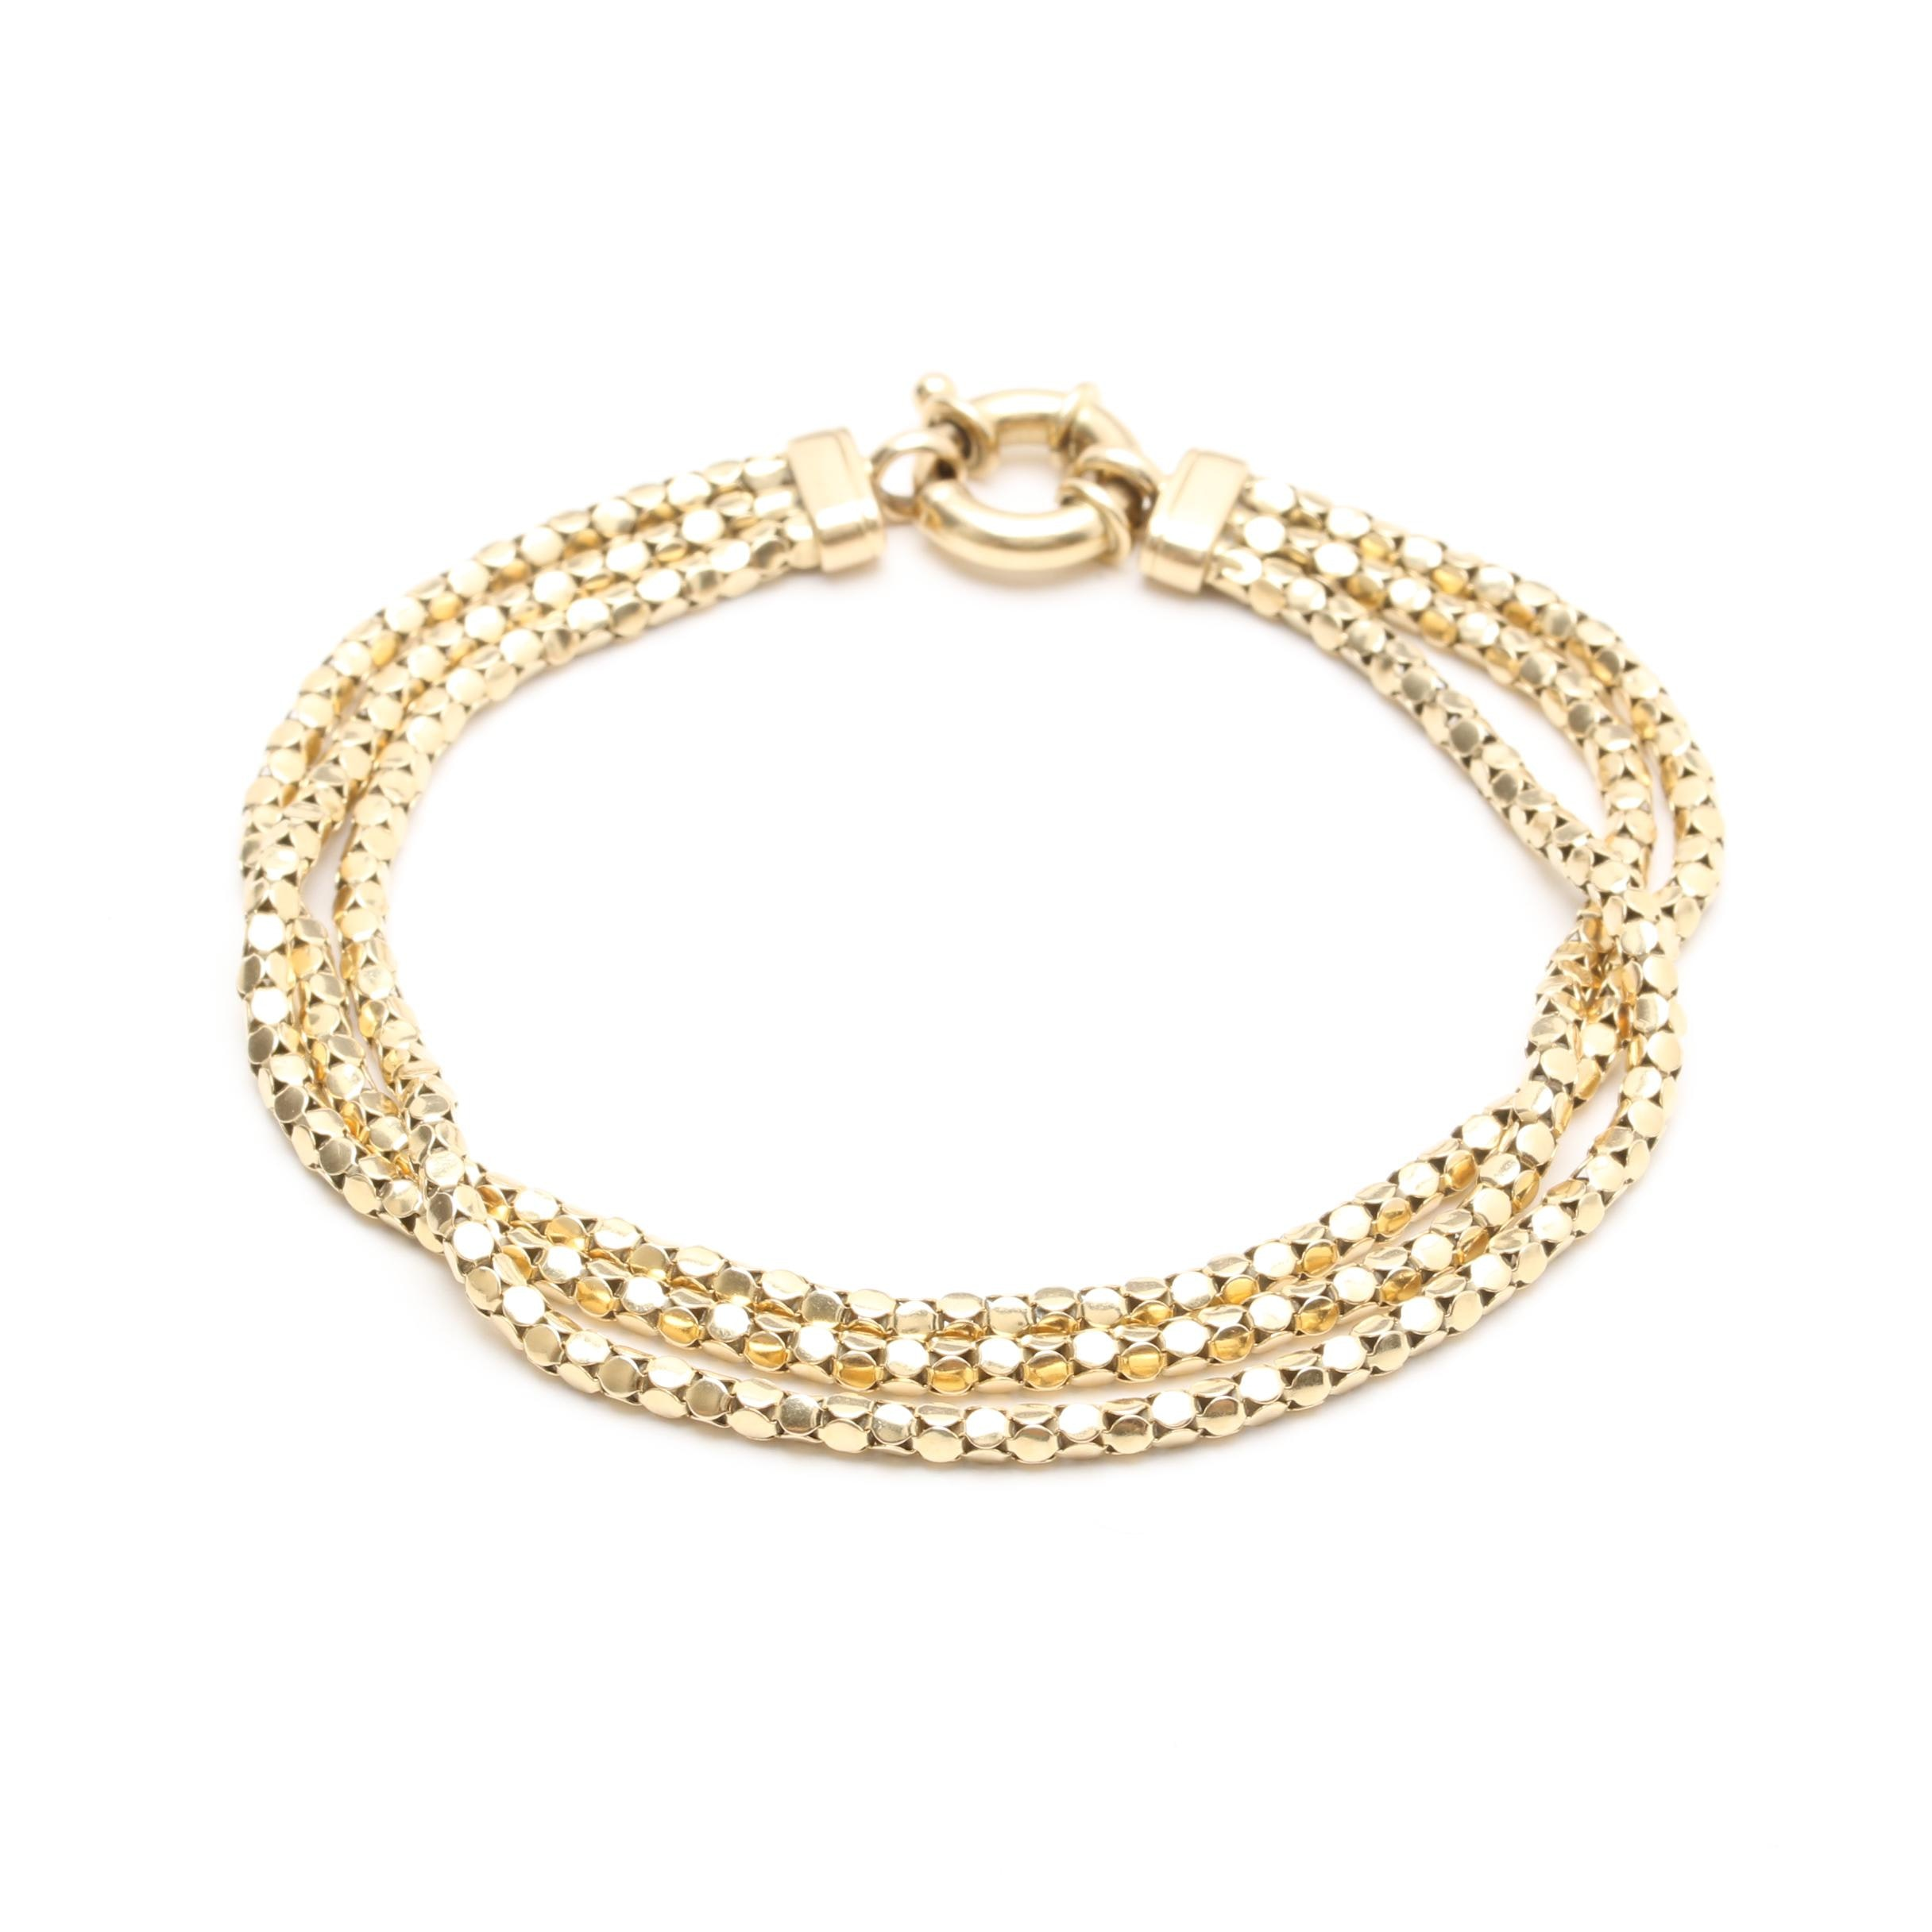 Michael Anthony 14K Yellow Gold Multi-Strand Bracelet